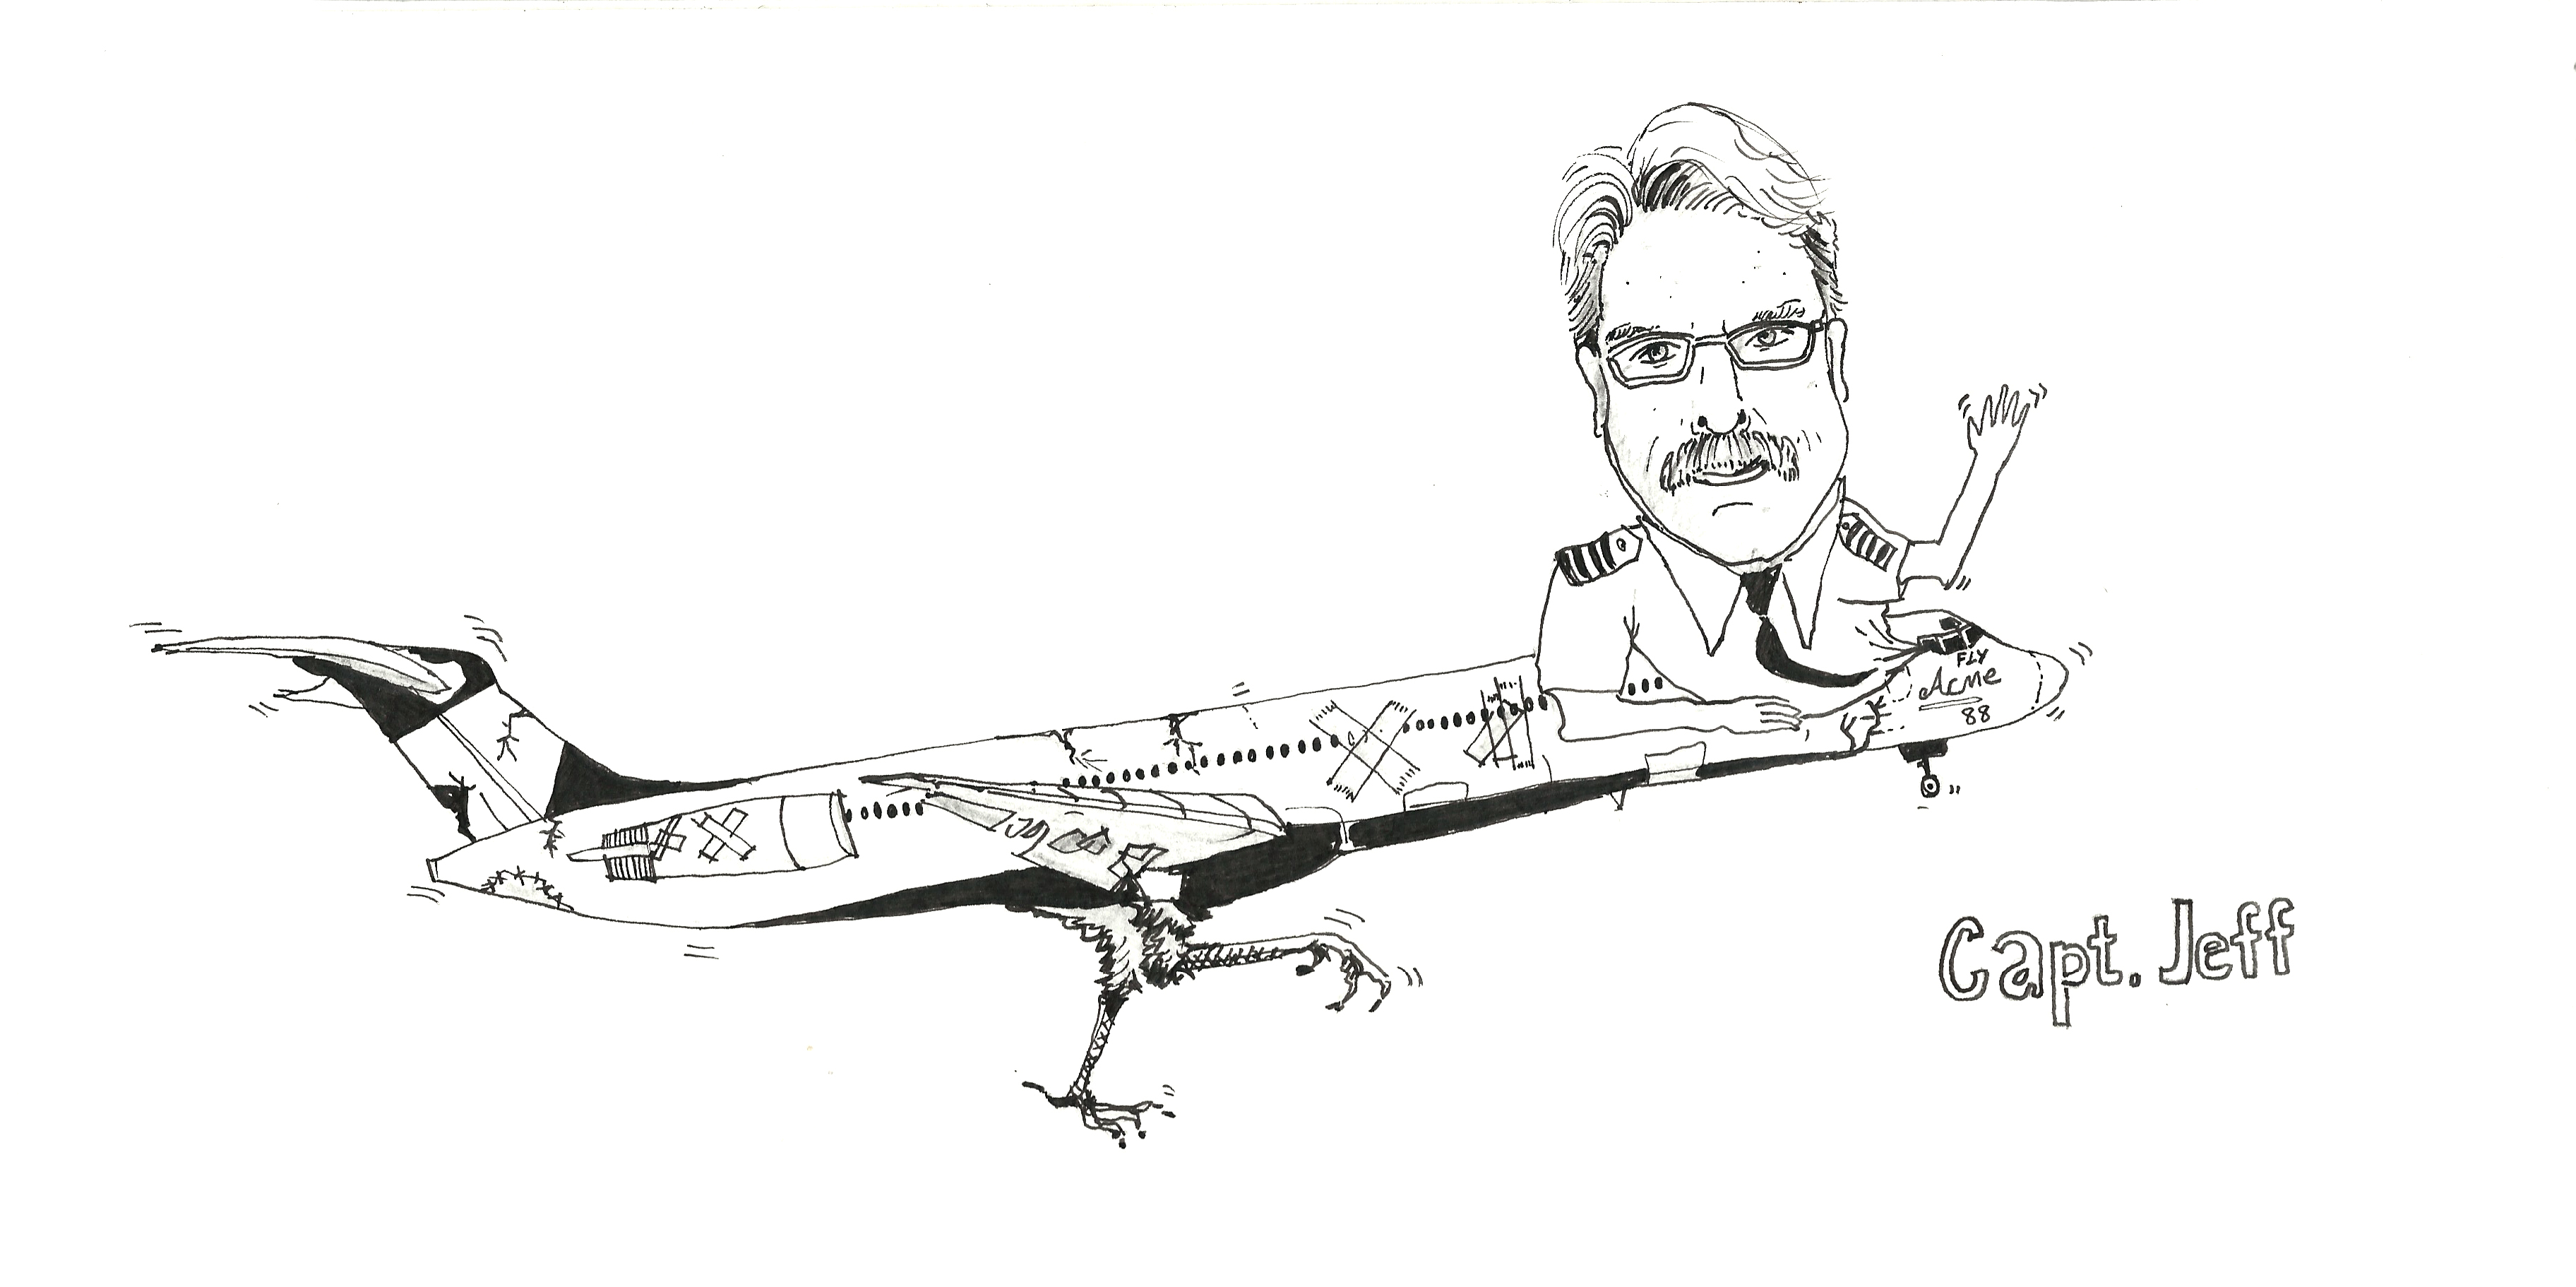 Apg 241 New Iraqi Airport Airline Pilot Guy